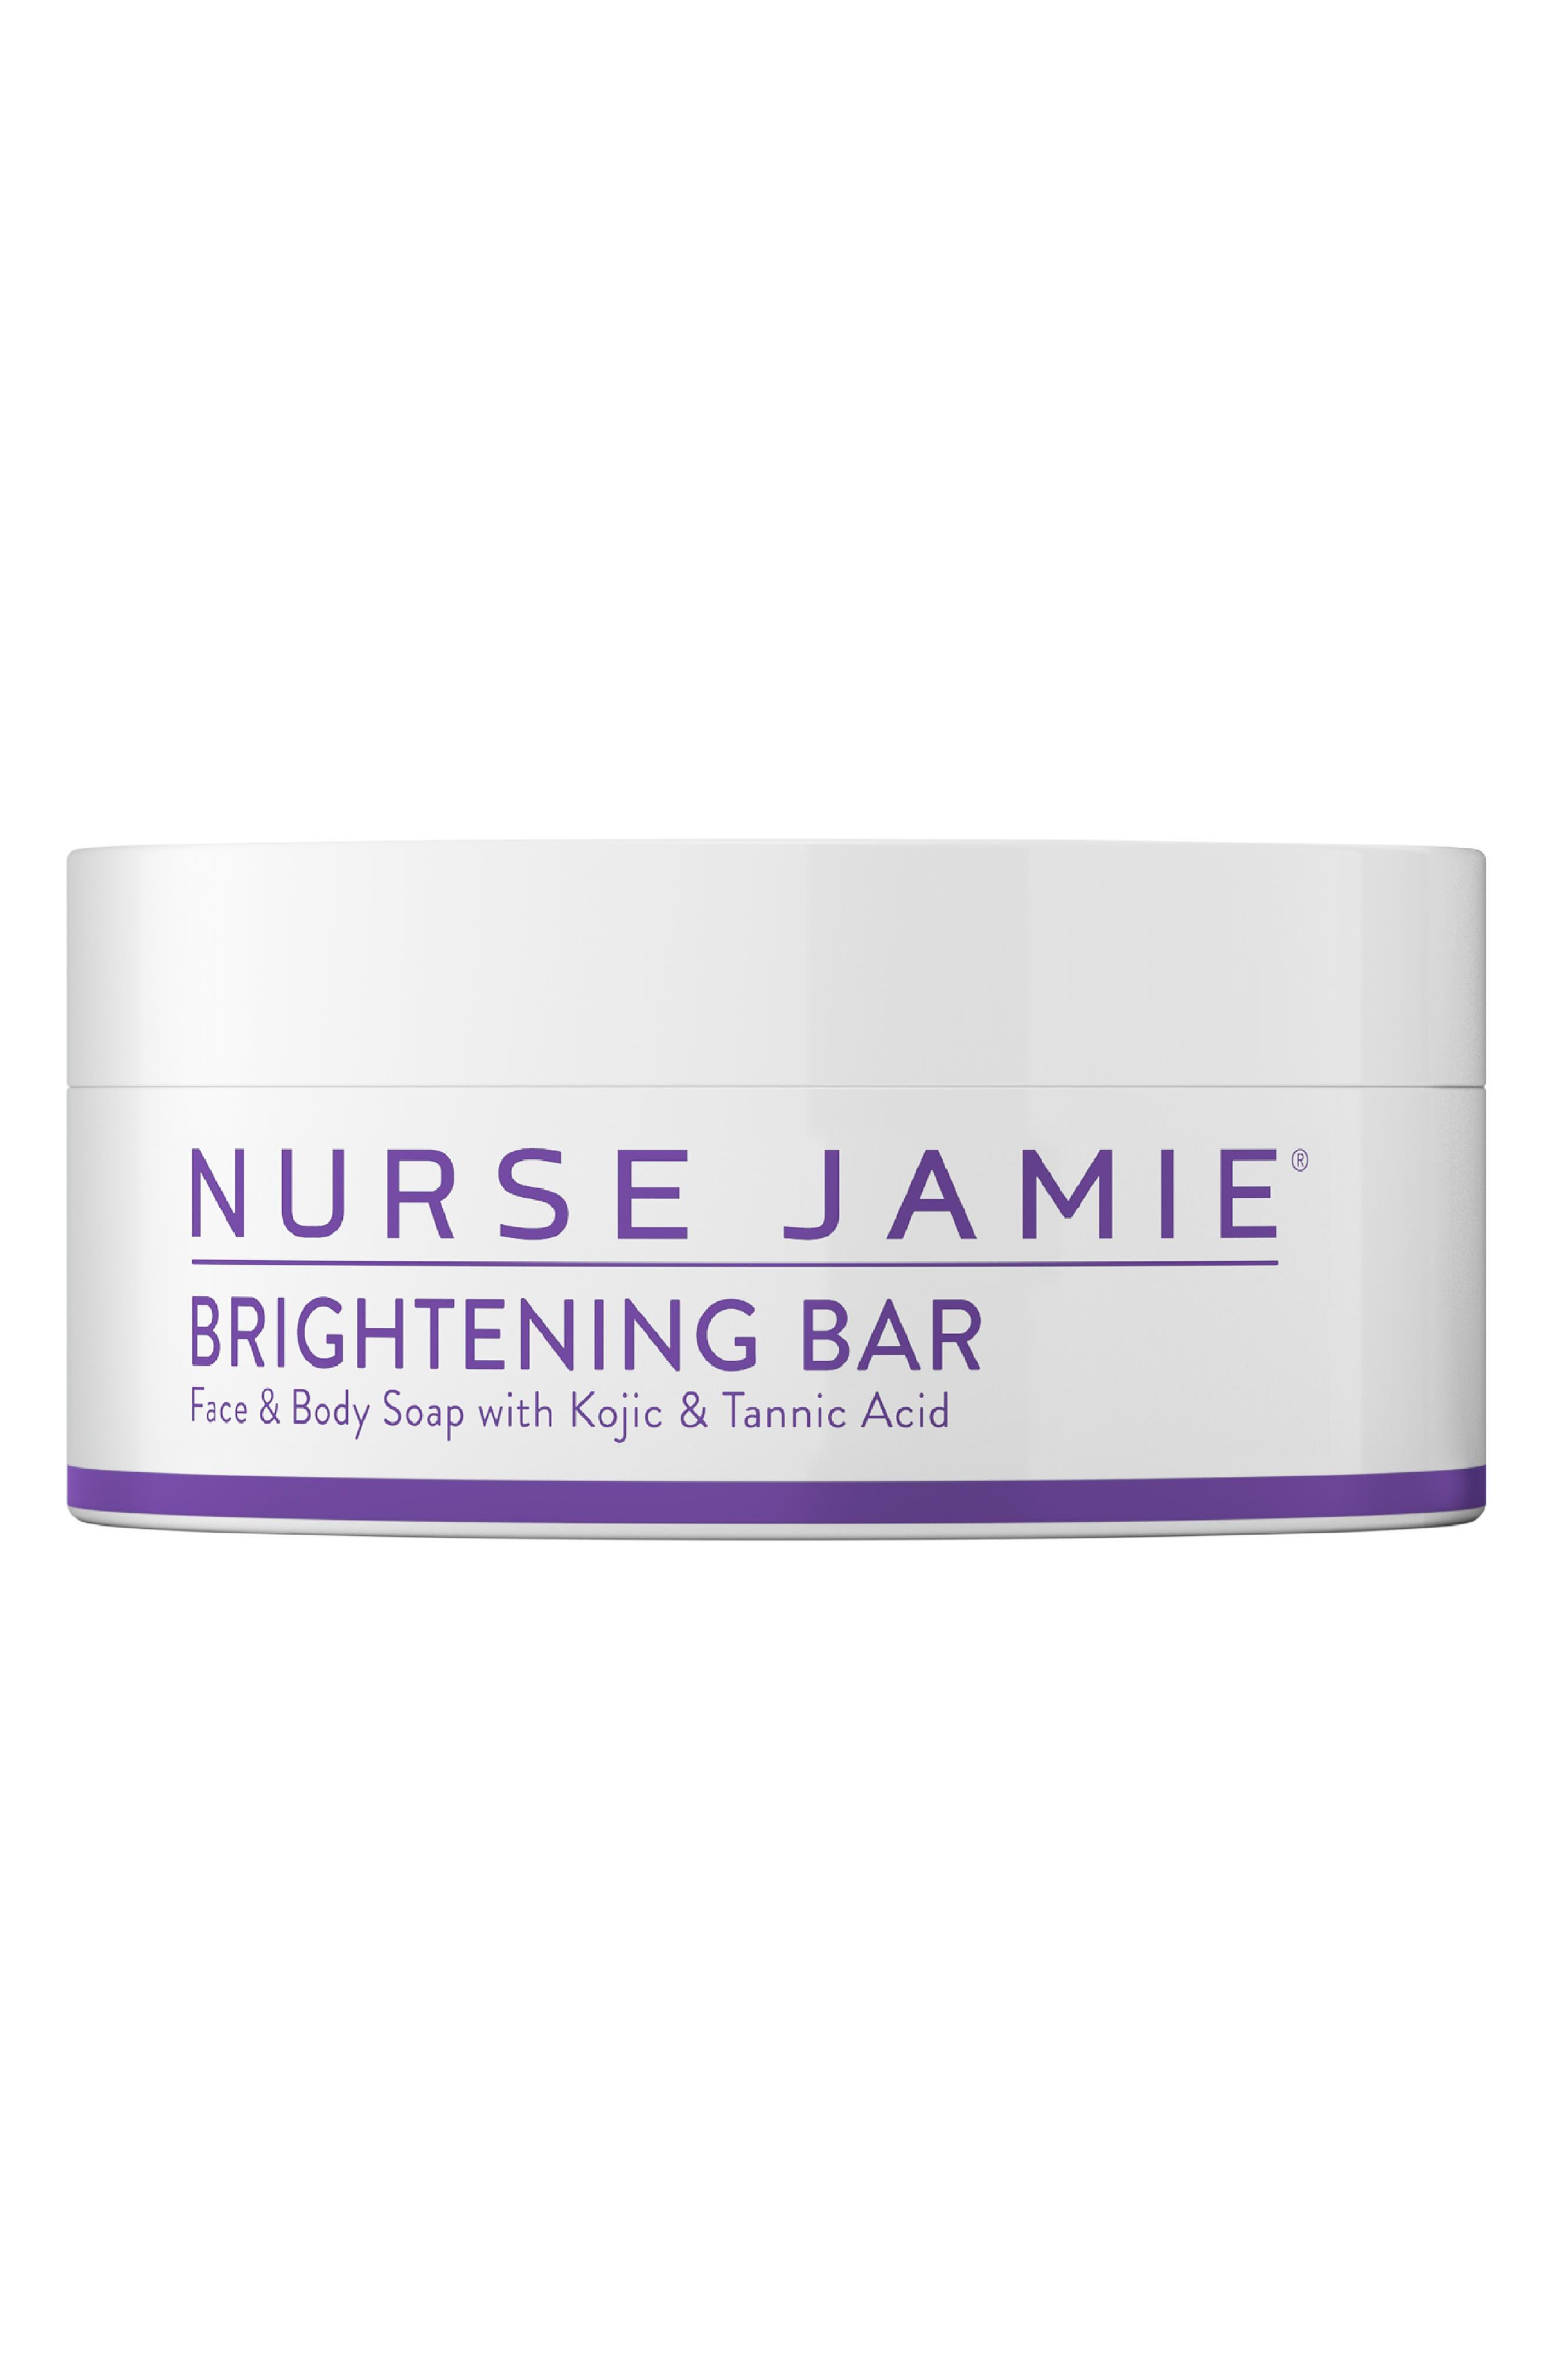 Fade to Light Pigment Erase Bar in a Jar,                         Main,                         color, NO COLOR